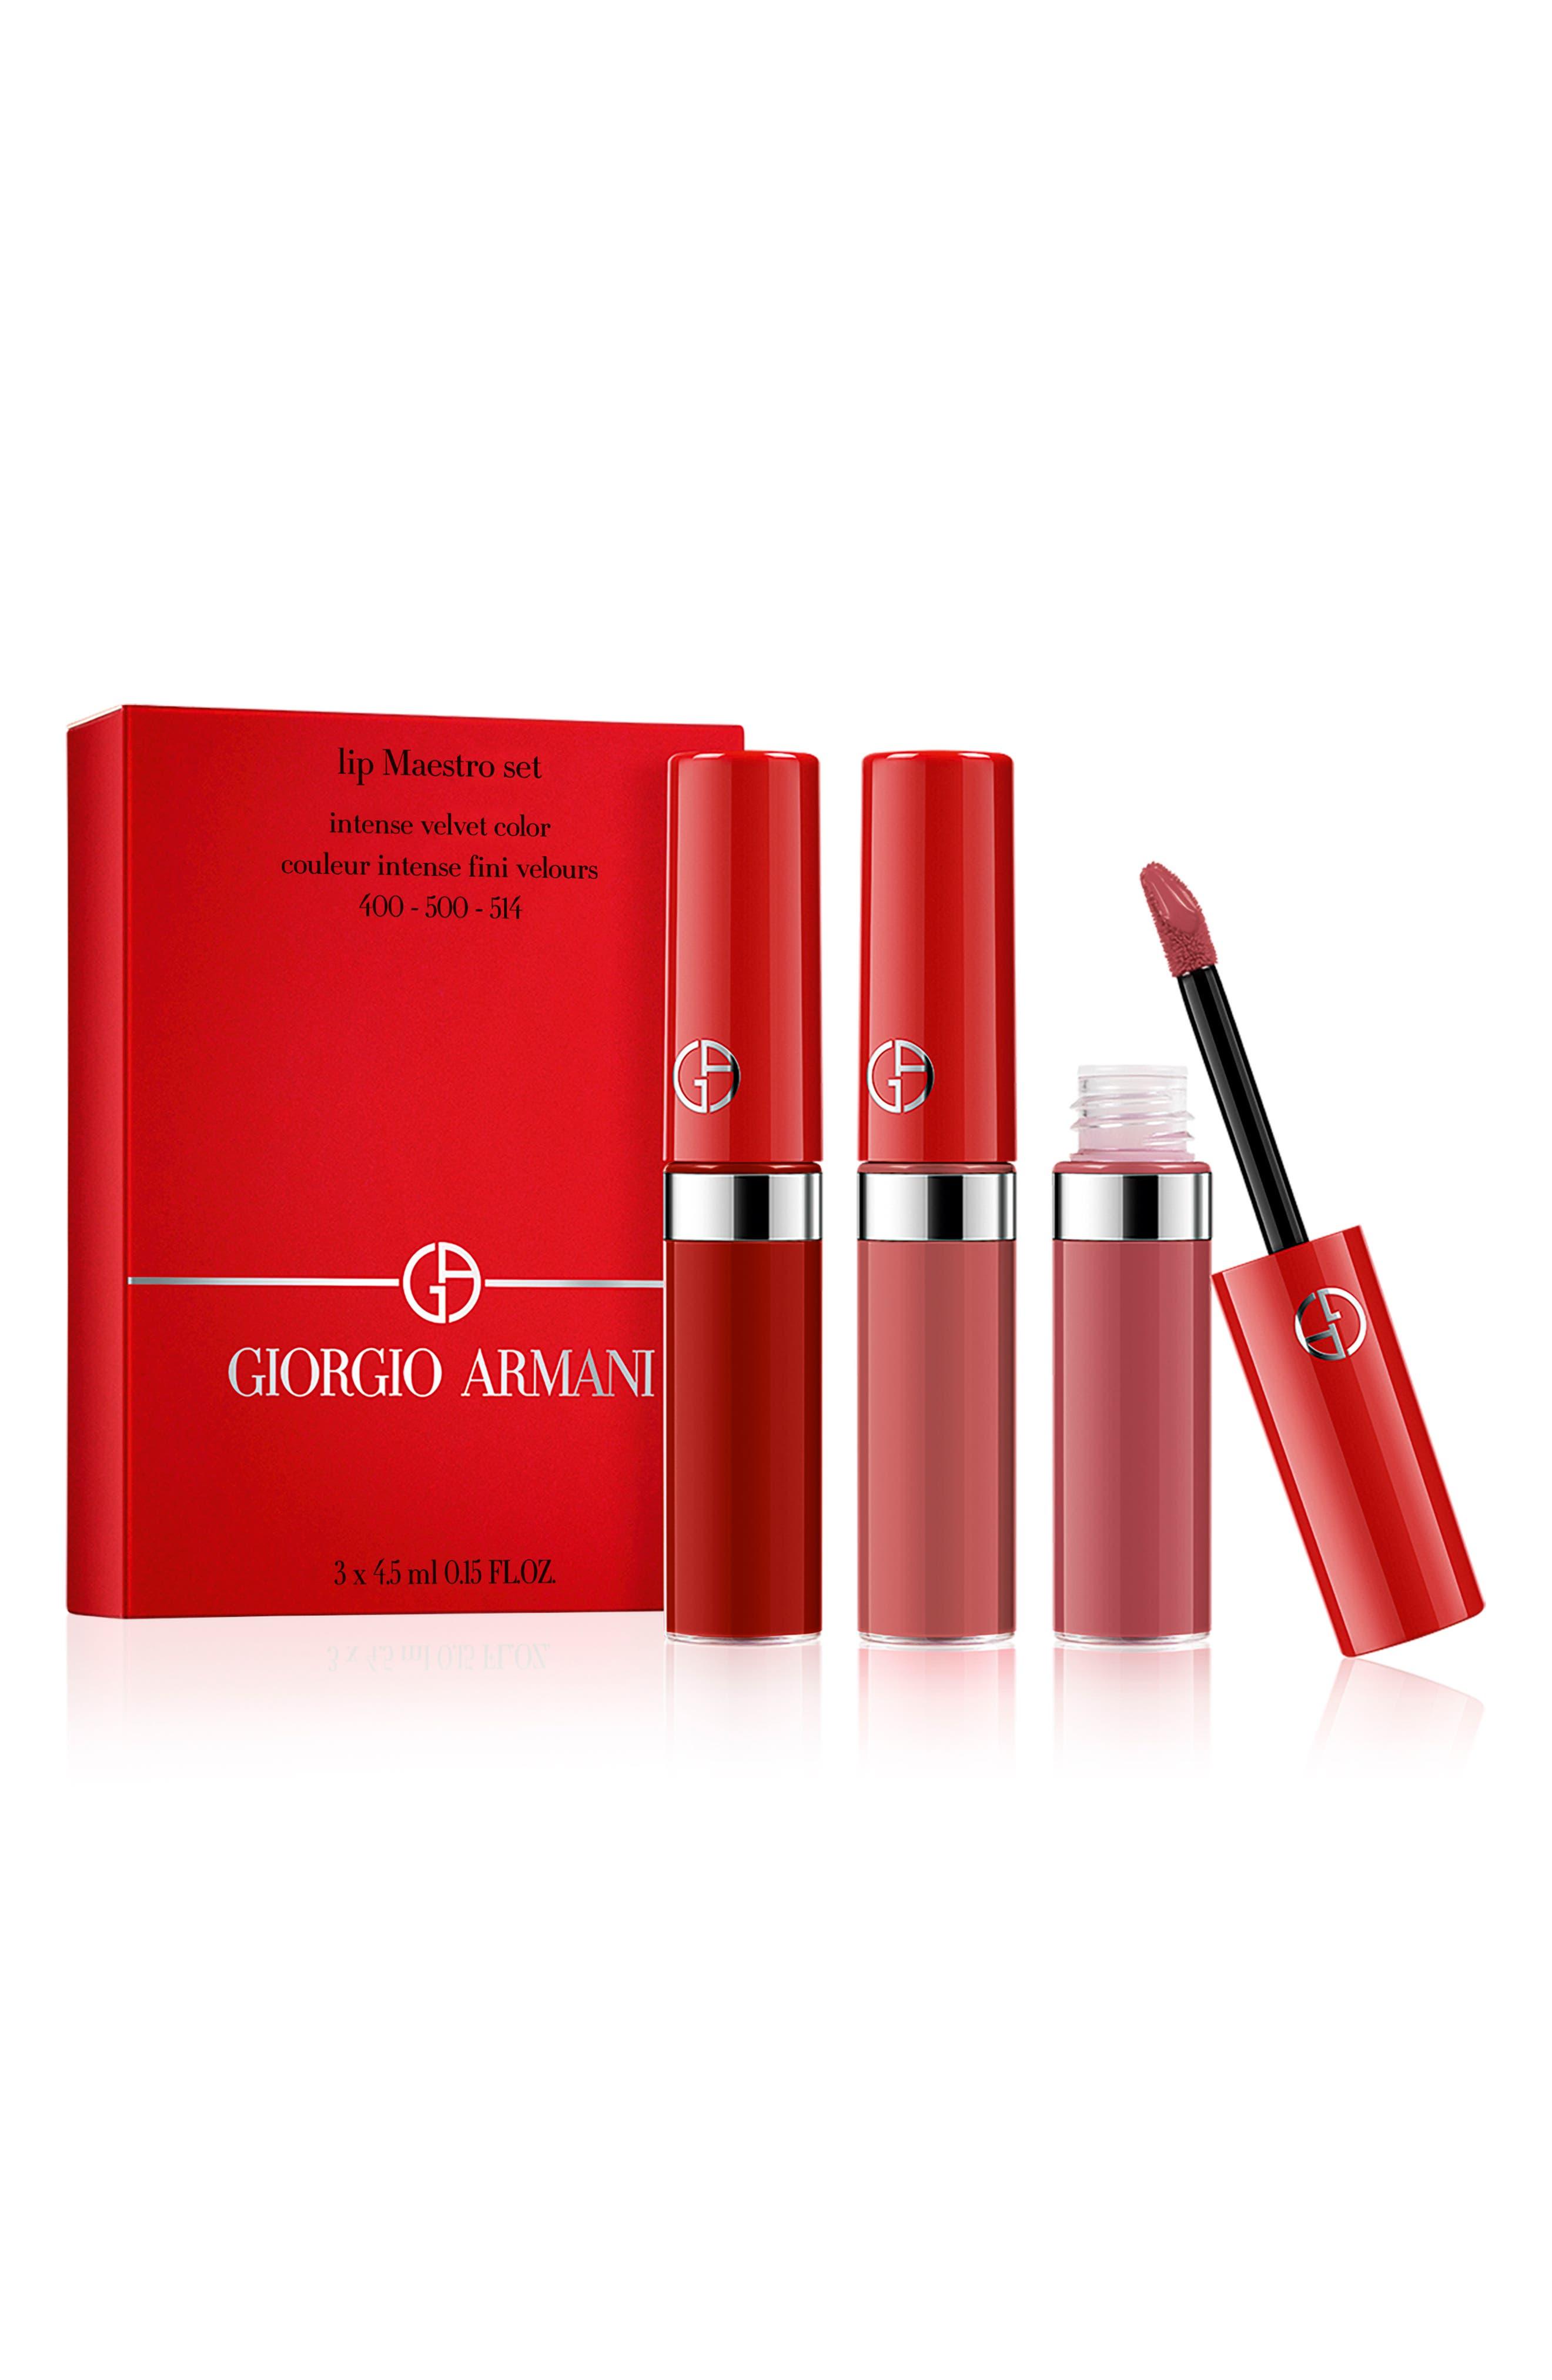 GIORGIO ARMANI,                             Travel Lip Maestro Set,                             Alternate thumbnail 2, color,                             000